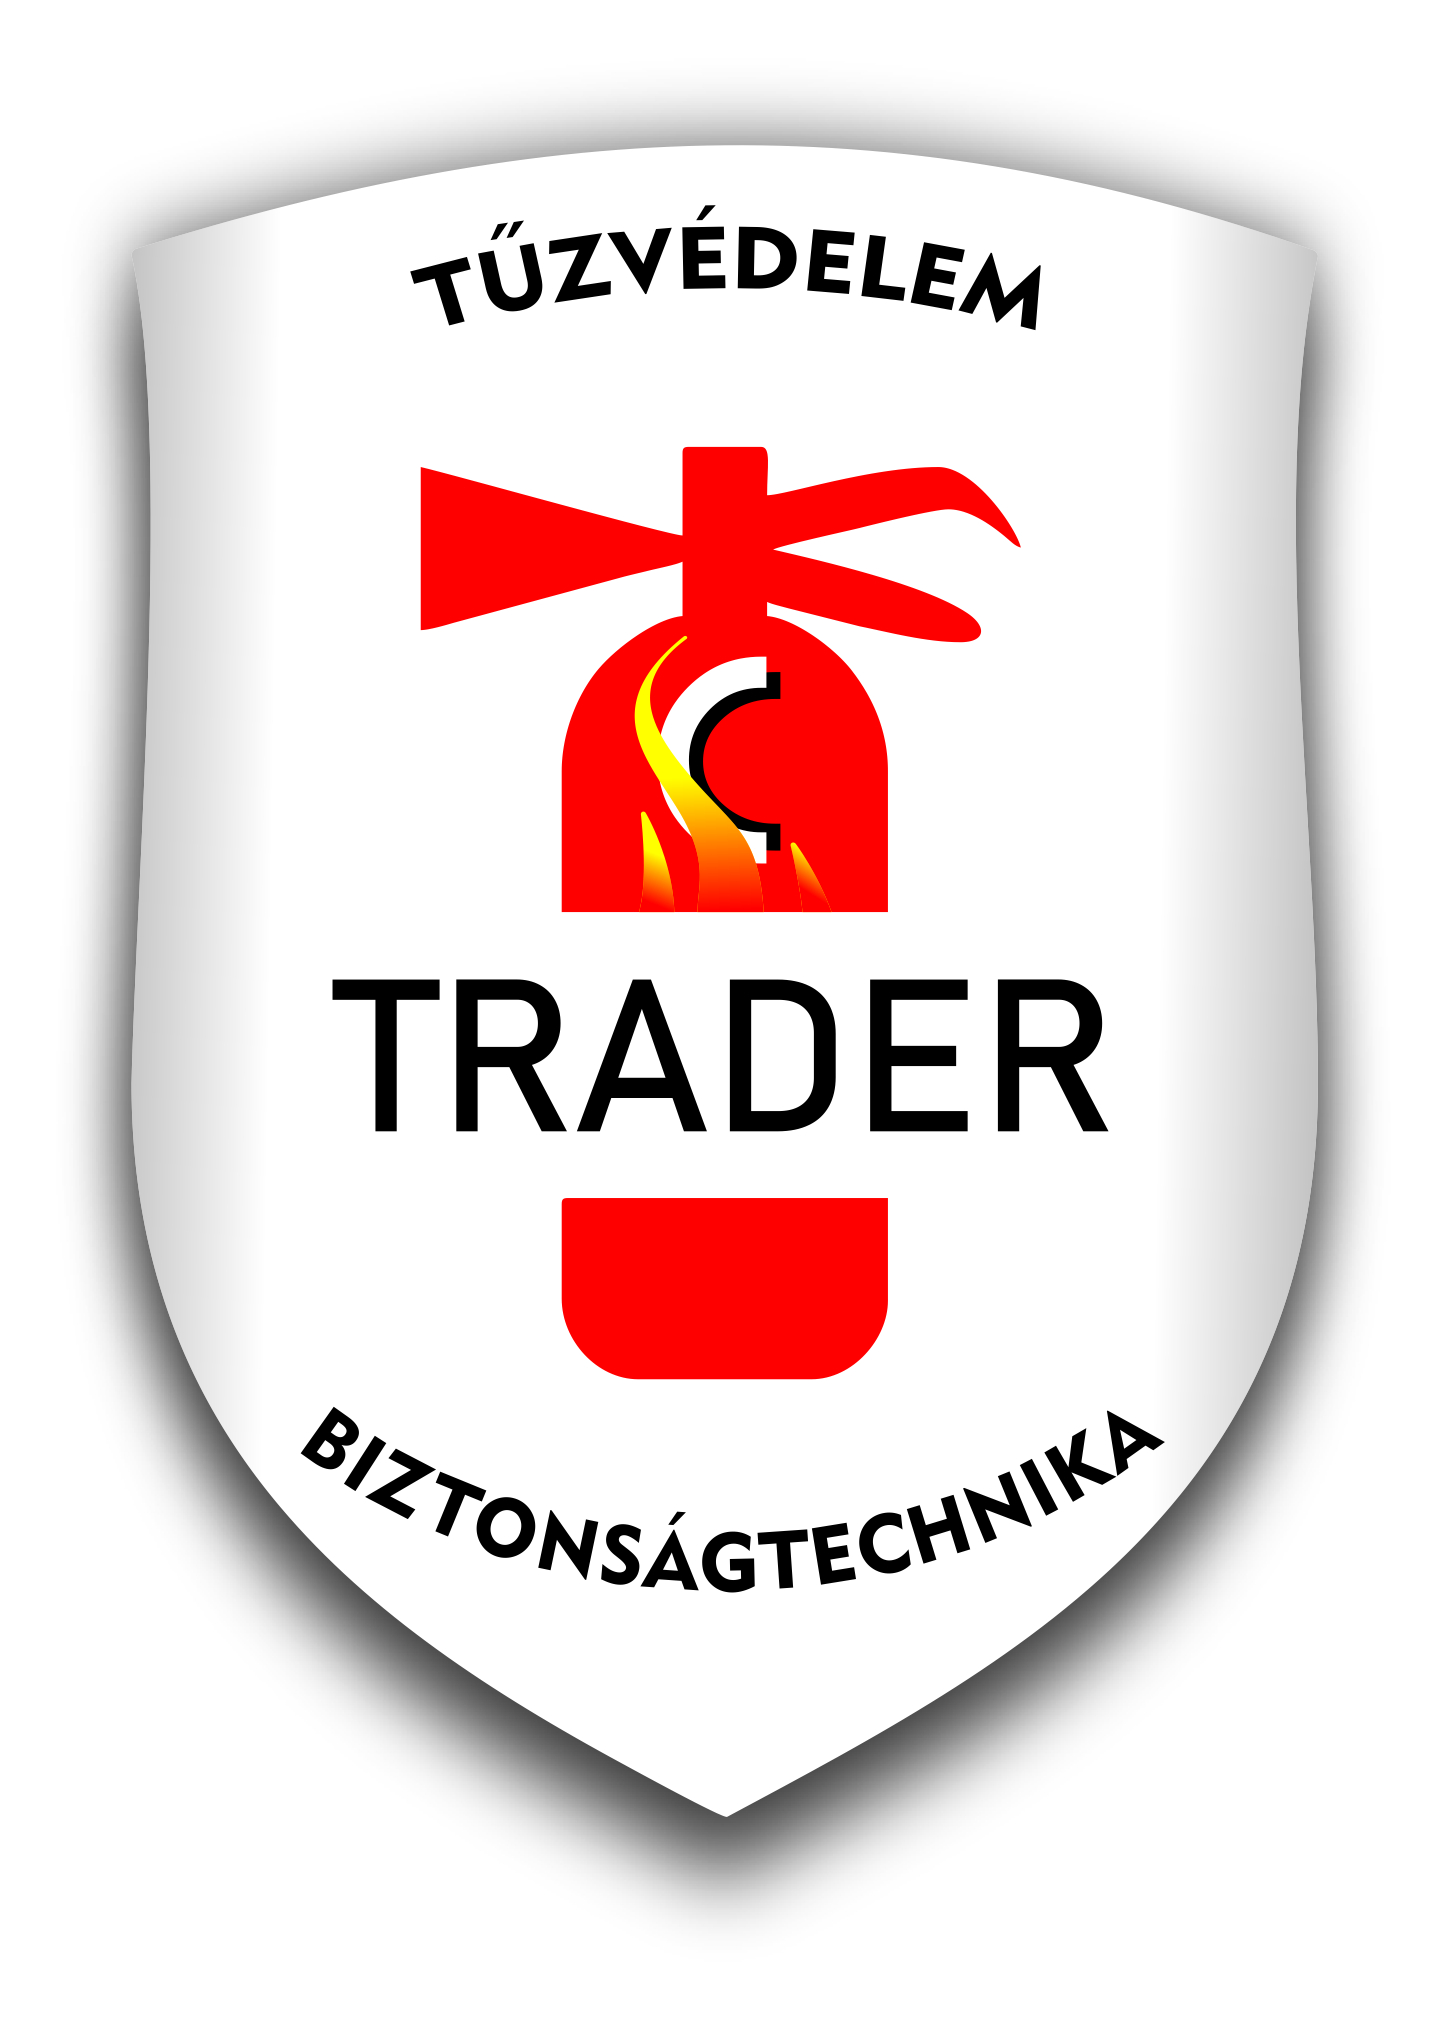 C Trader Biztonságtechnikai Kft.